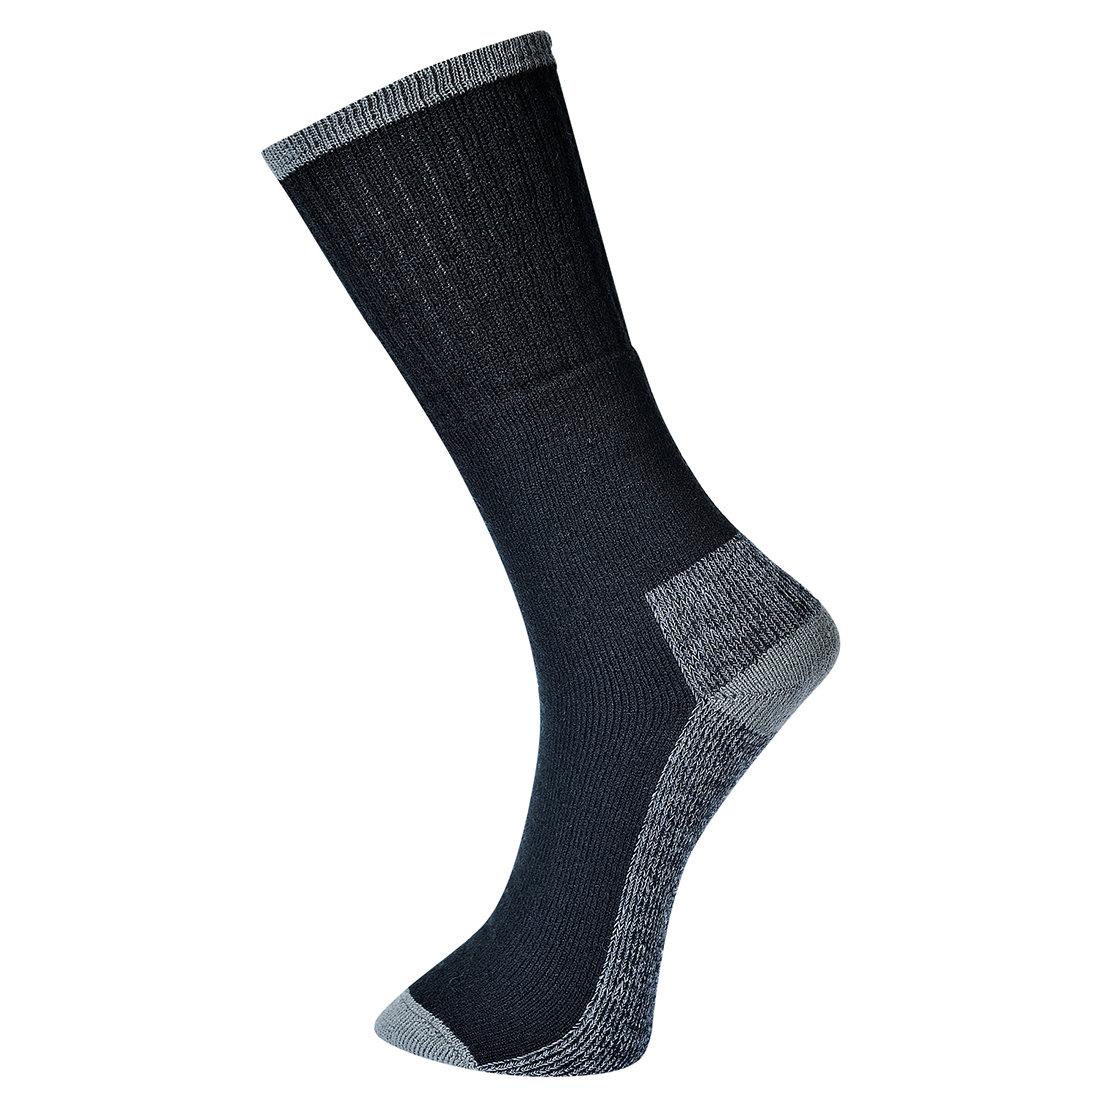 Redrok Workwear Centre Plymouth Work Sock 3 Pairs - Black